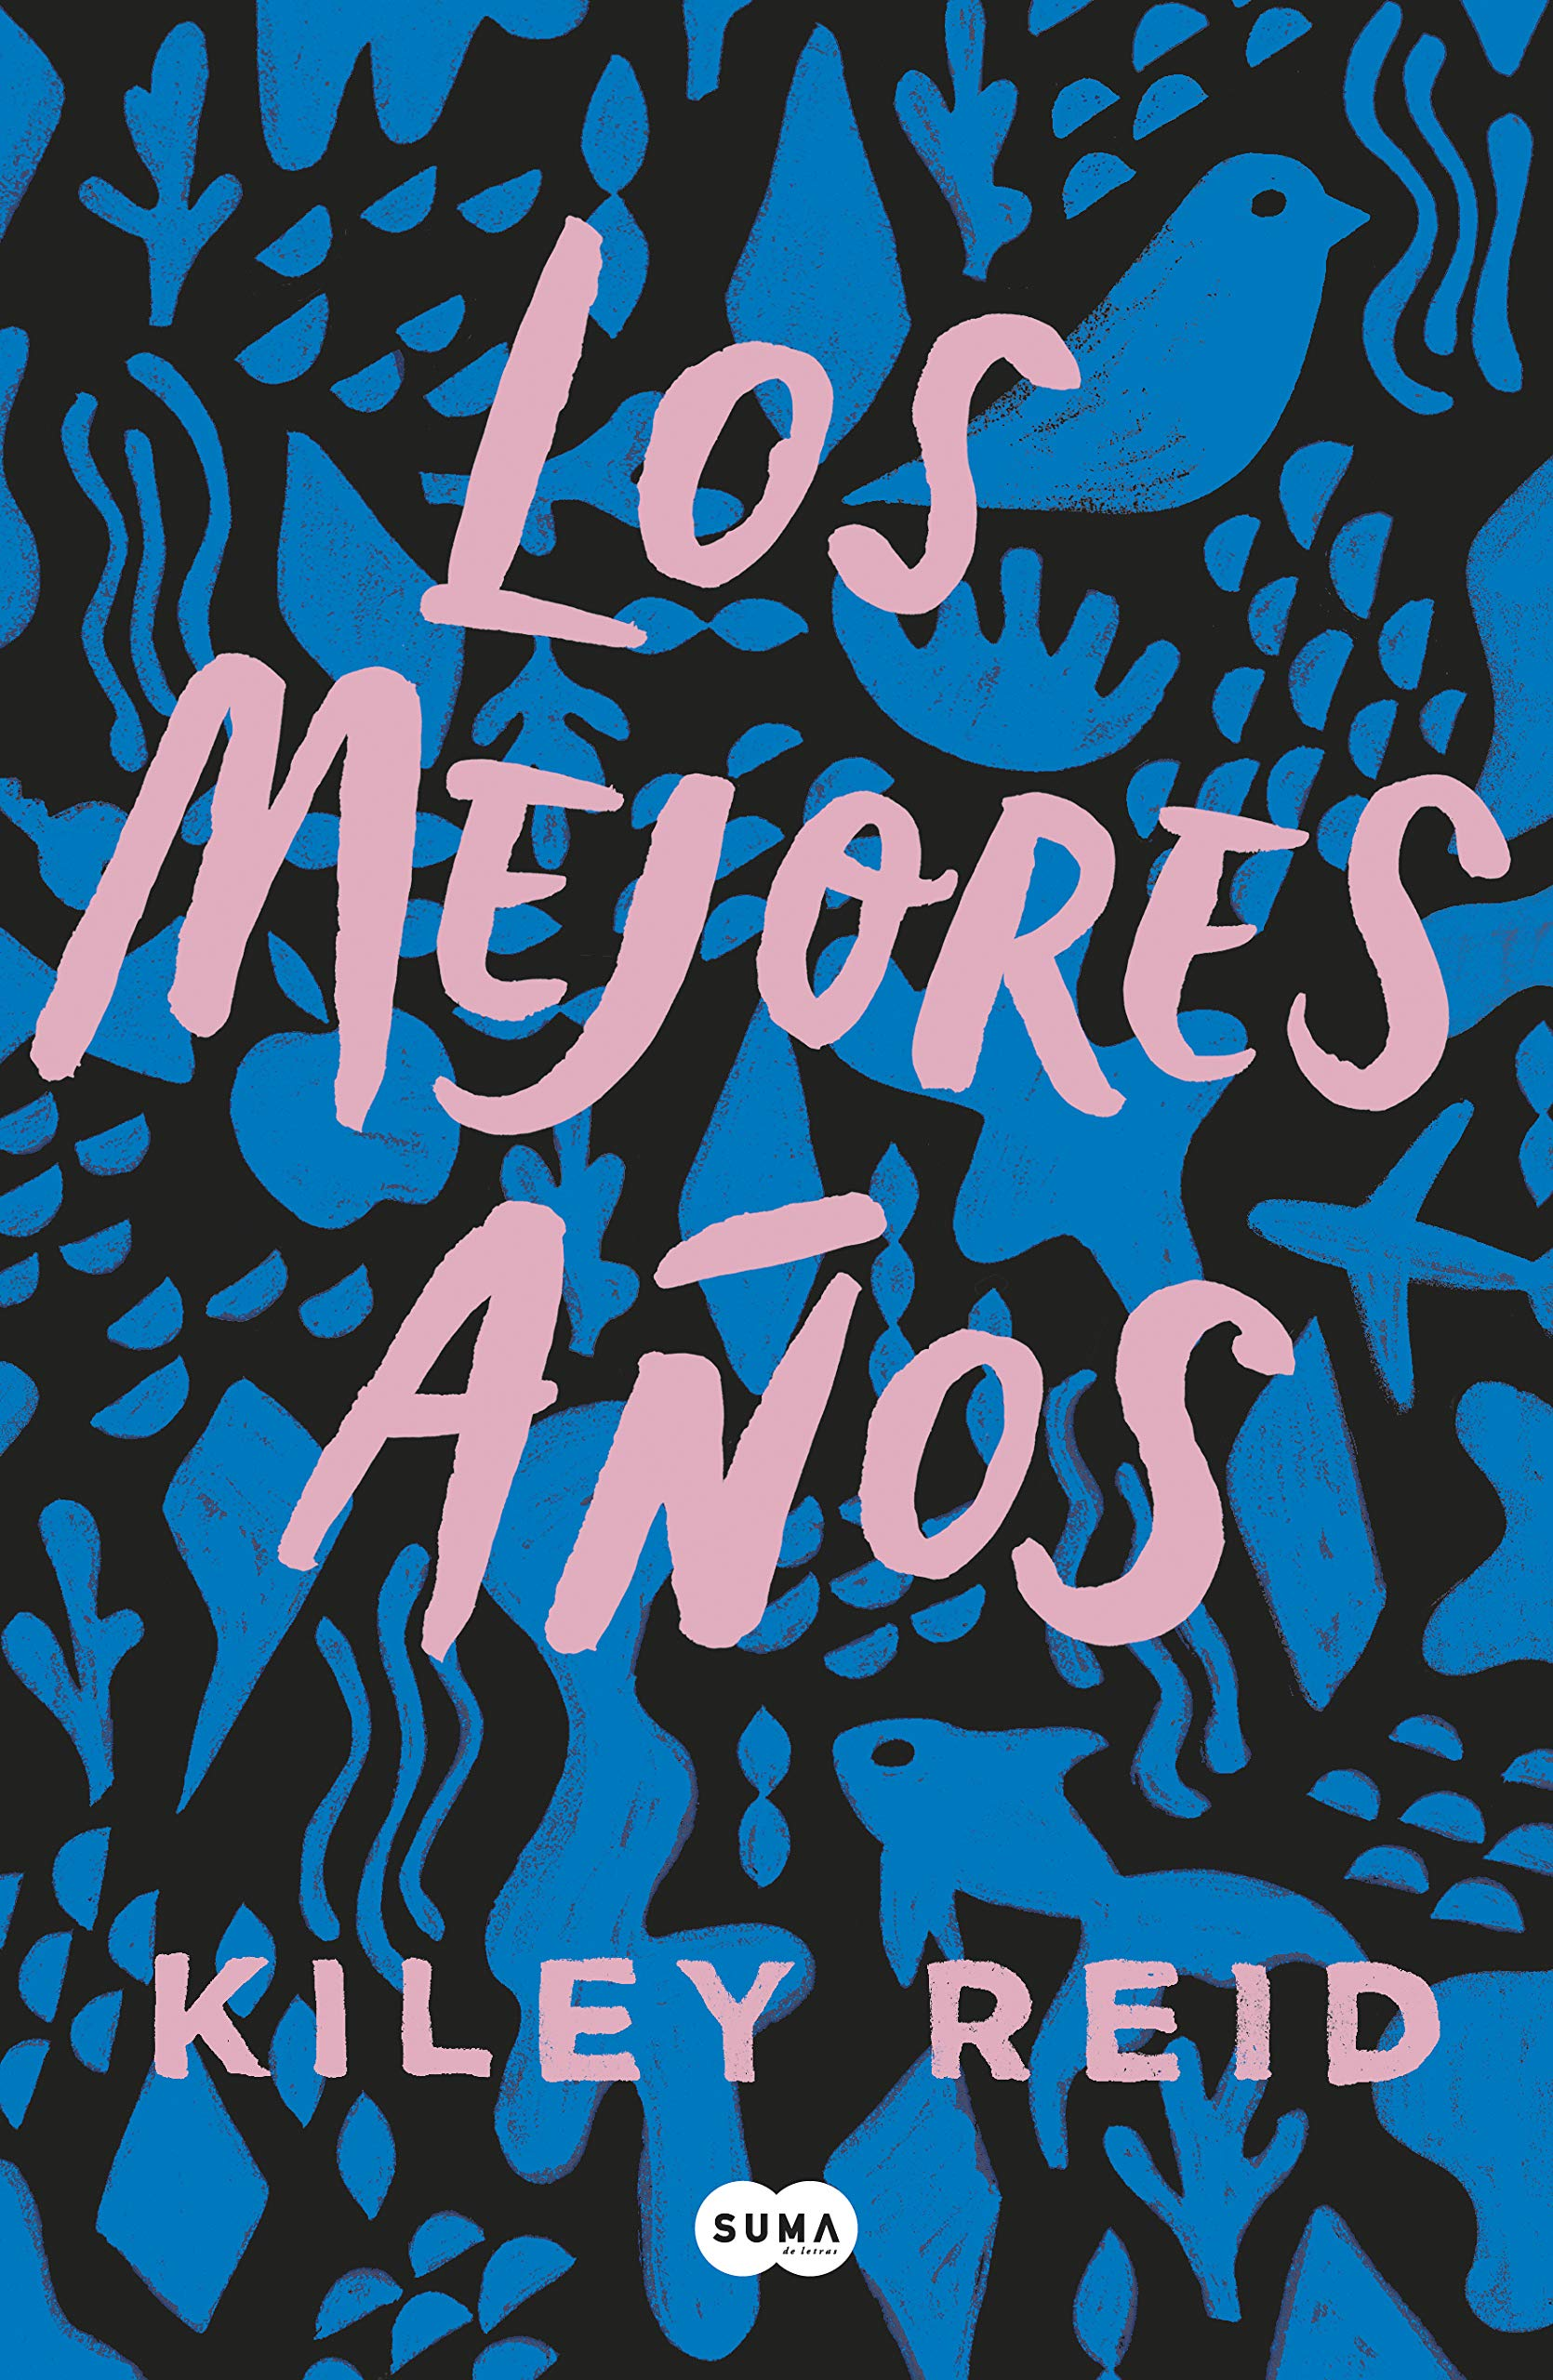 Amazon.com: Los mejores años (SUMA) (Spanish Edition) (9788491295174): Reid,  Kiley, Laura Vidal Sanz;: Books